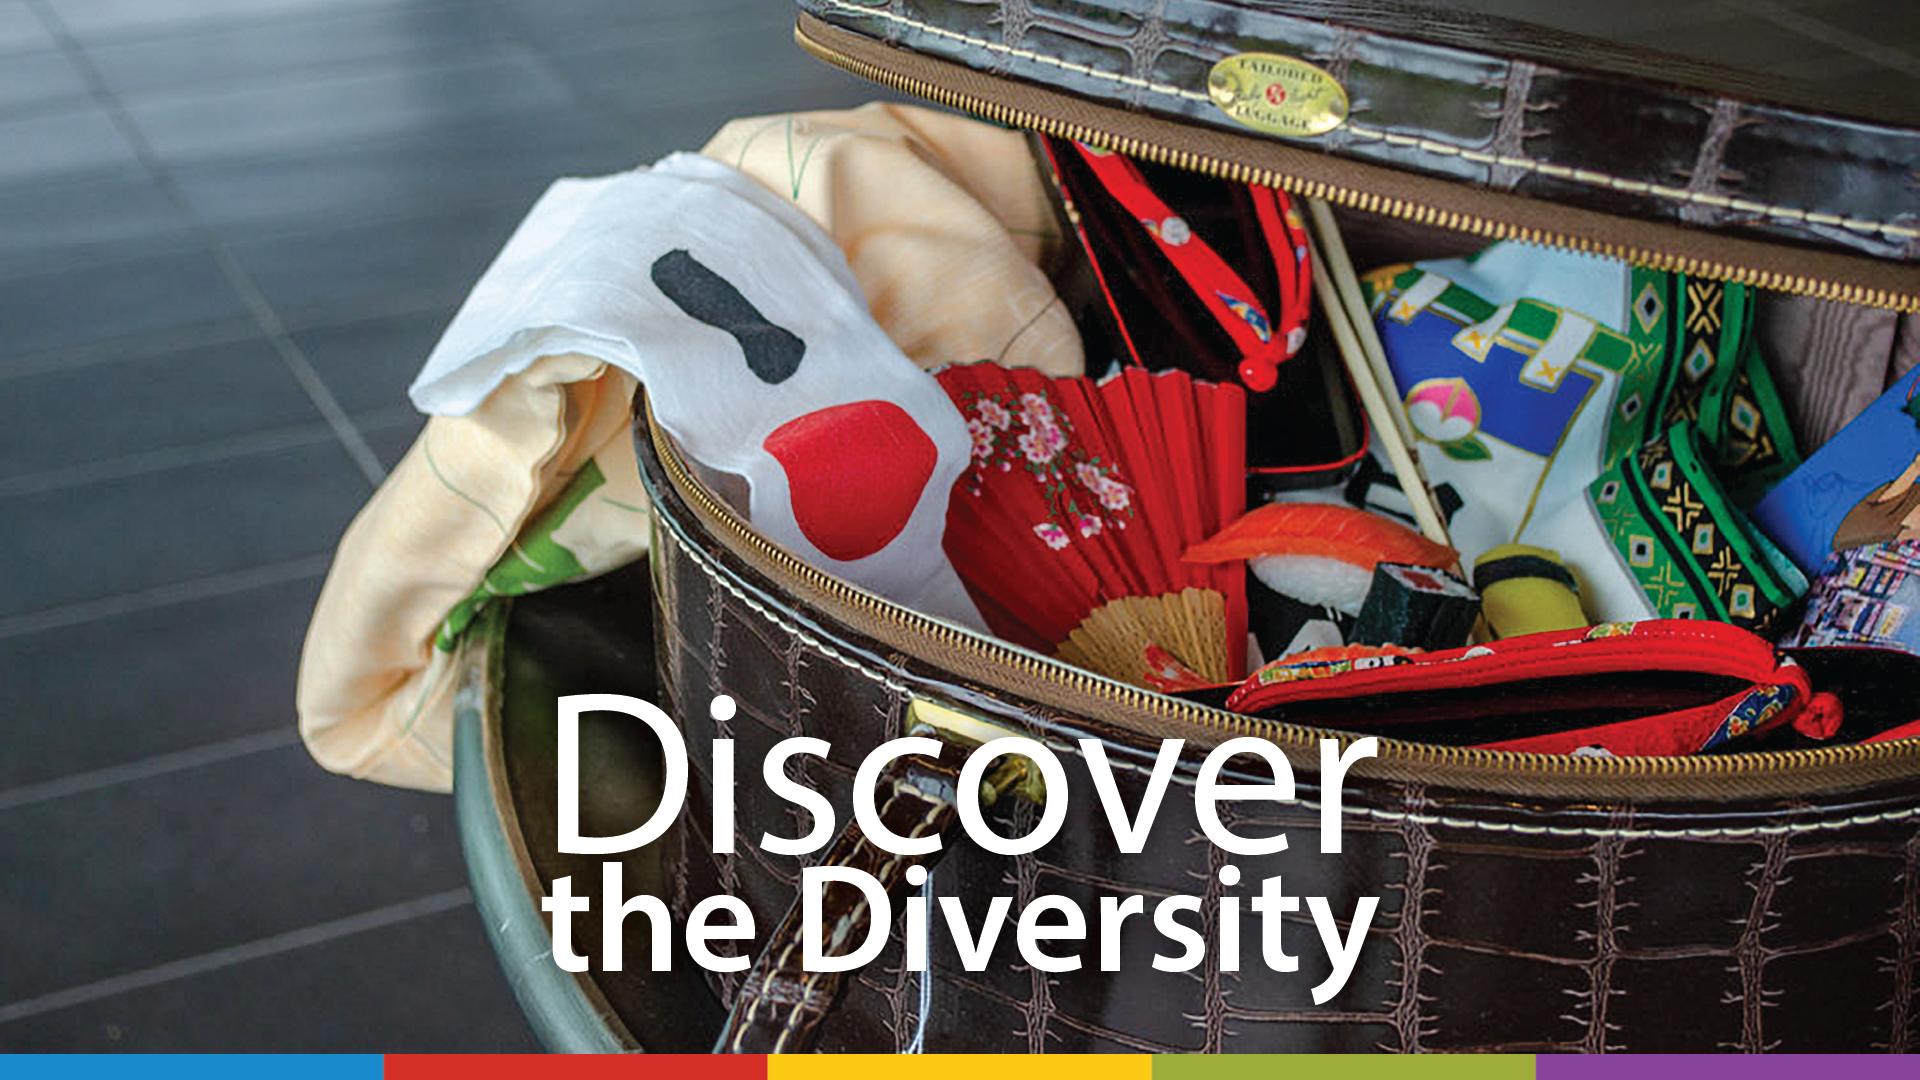 DiscoverDiversityEventBanner-01.png